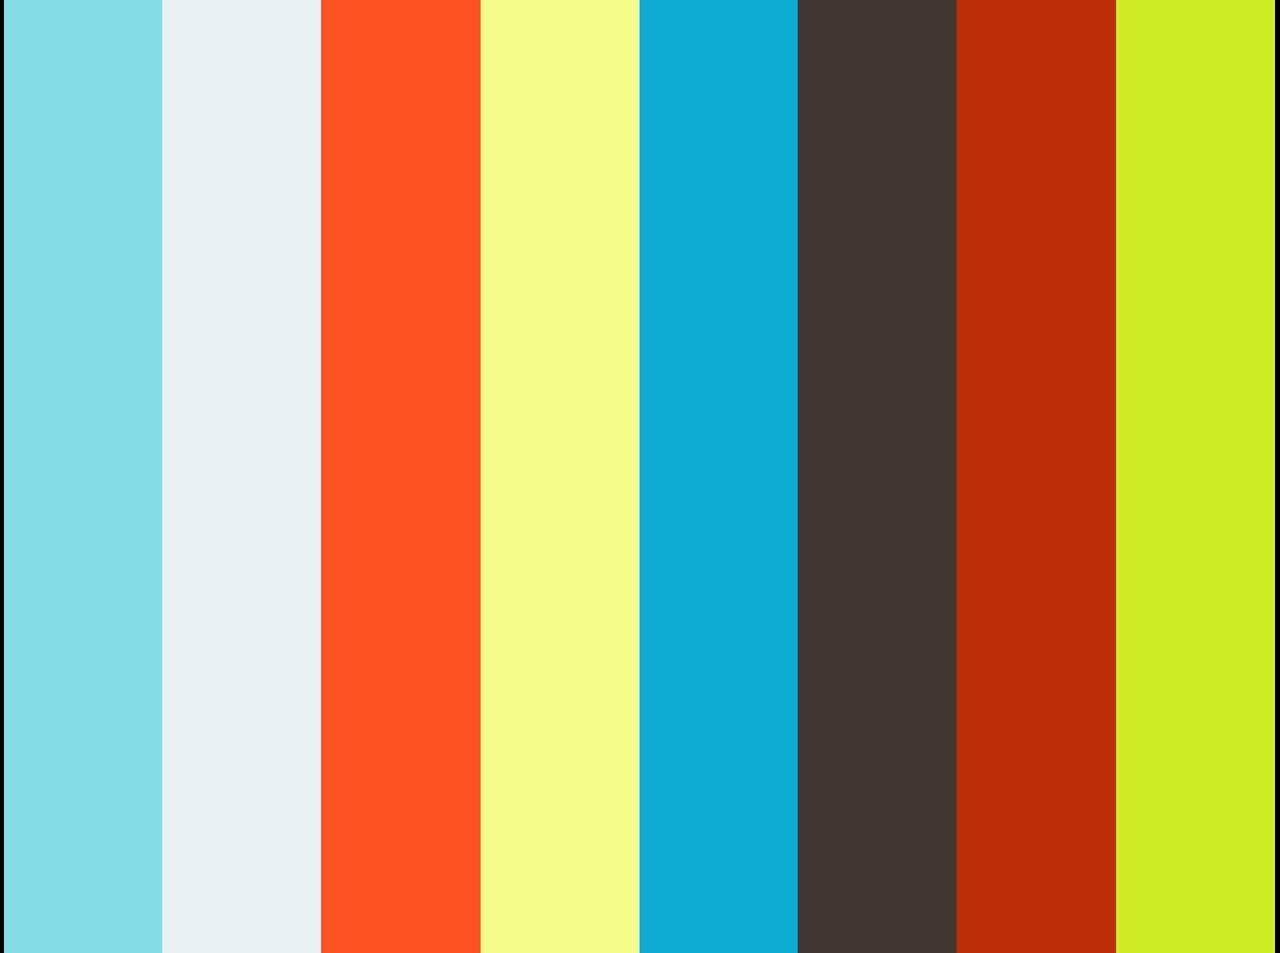 Restart 12/1/12: Συνέντευξη Δημήτρη Ασπροπούλη και Δημήτρη Συρματση